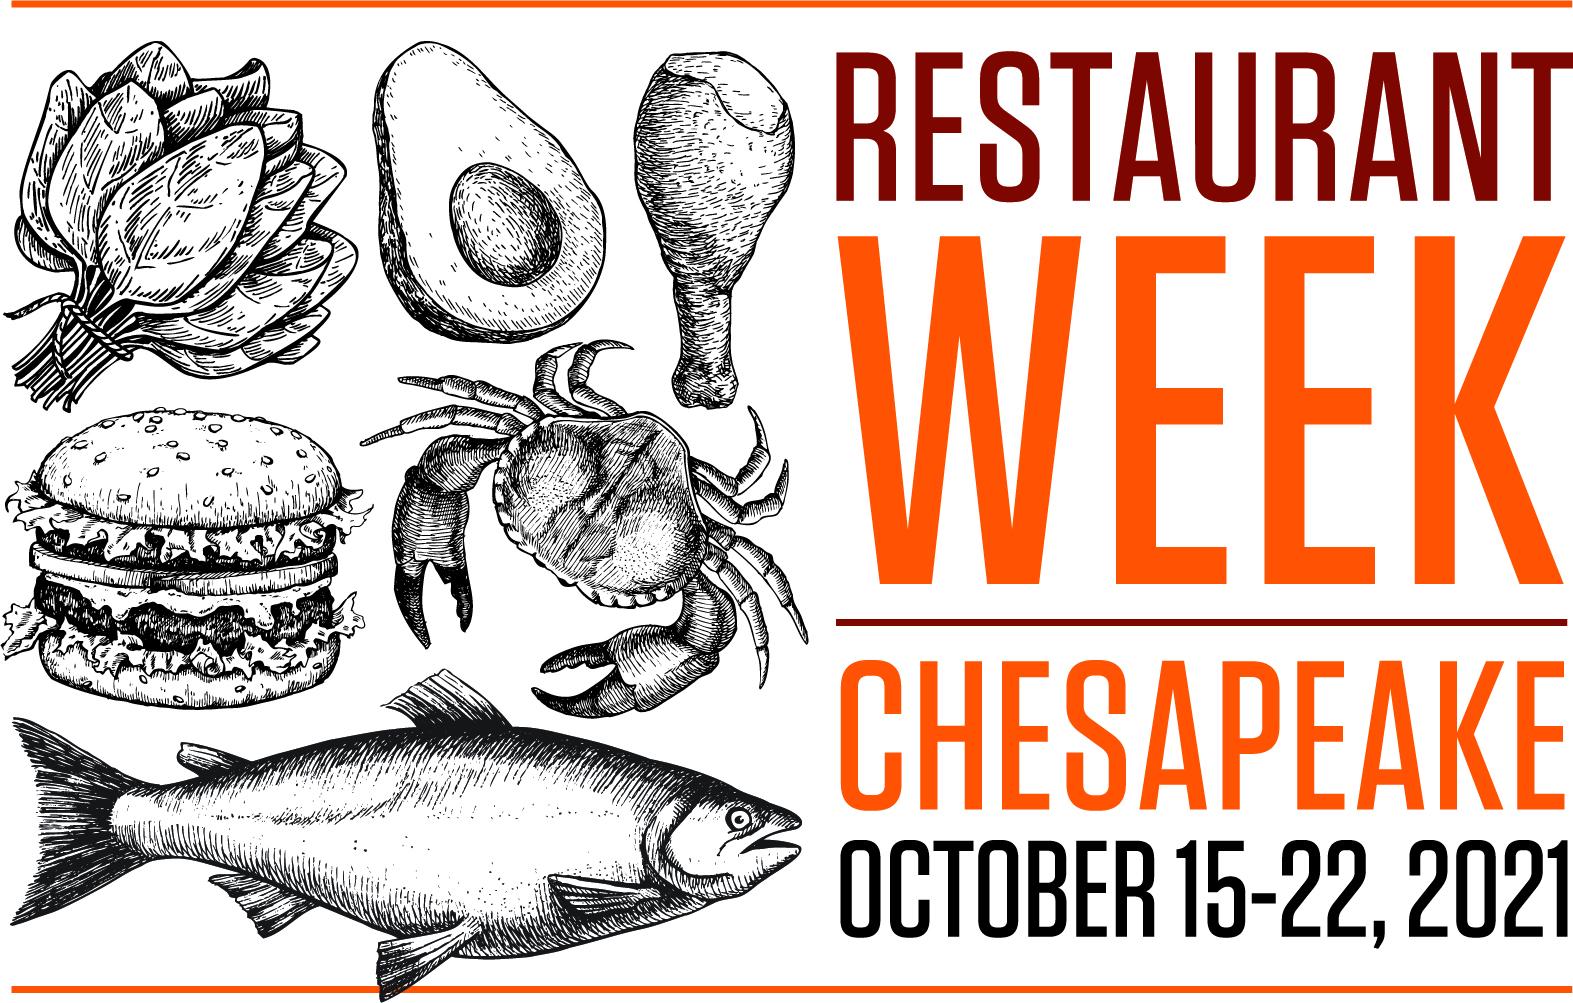 Chesapeake Restaurant Week 2021